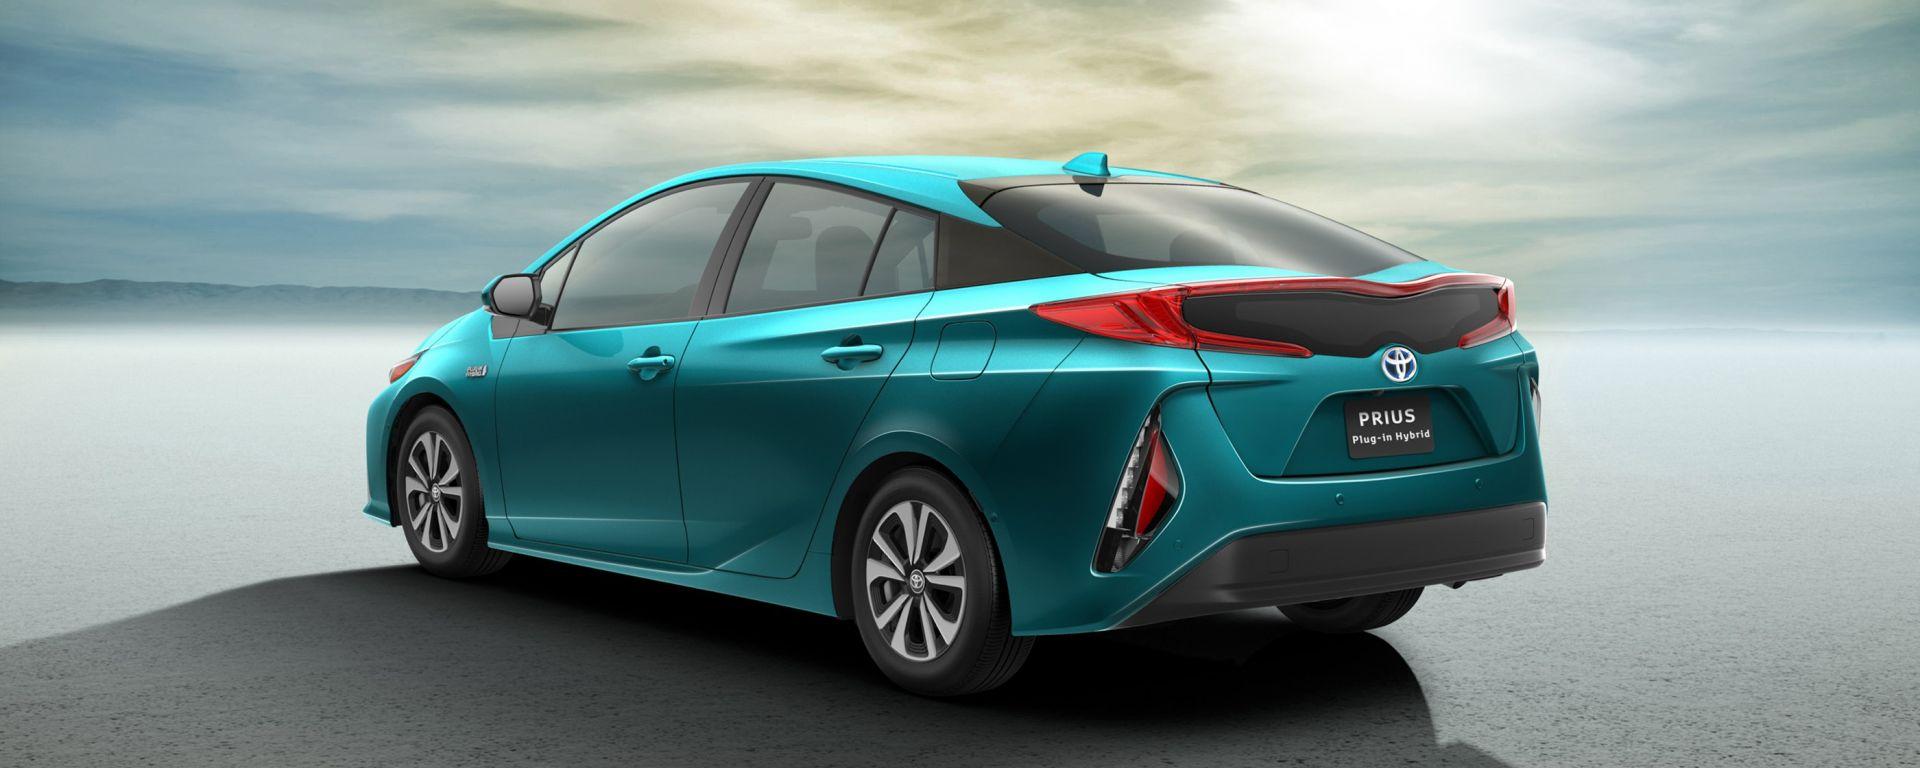 Automotive Edge: Intel e Toyota per la guida autonoma